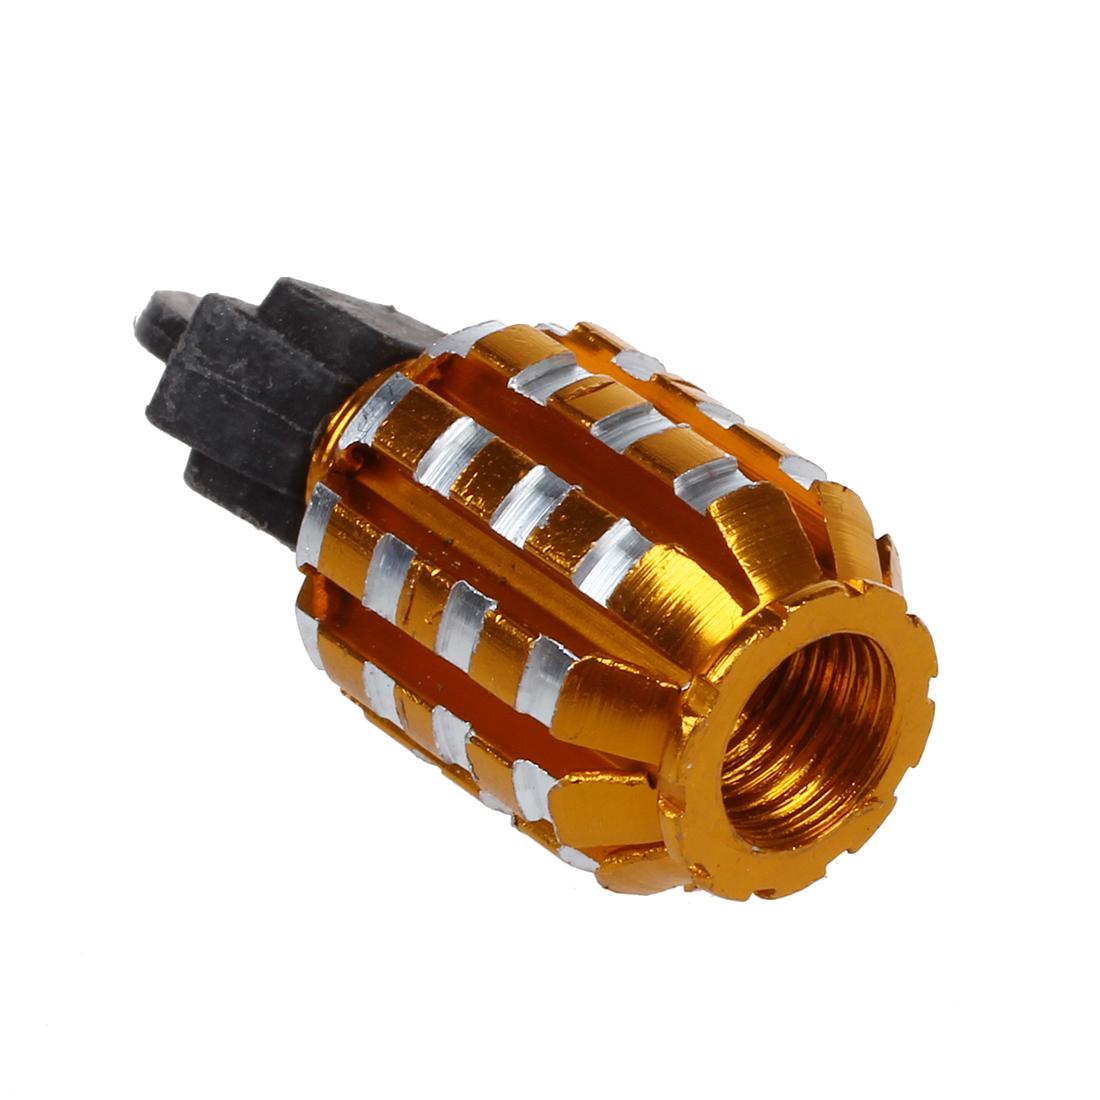 cool or en forme de grenade voiture auto pneu valve bouchons couverture wt ebay. Black Bedroom Furniture Sets. Home Design Ideas